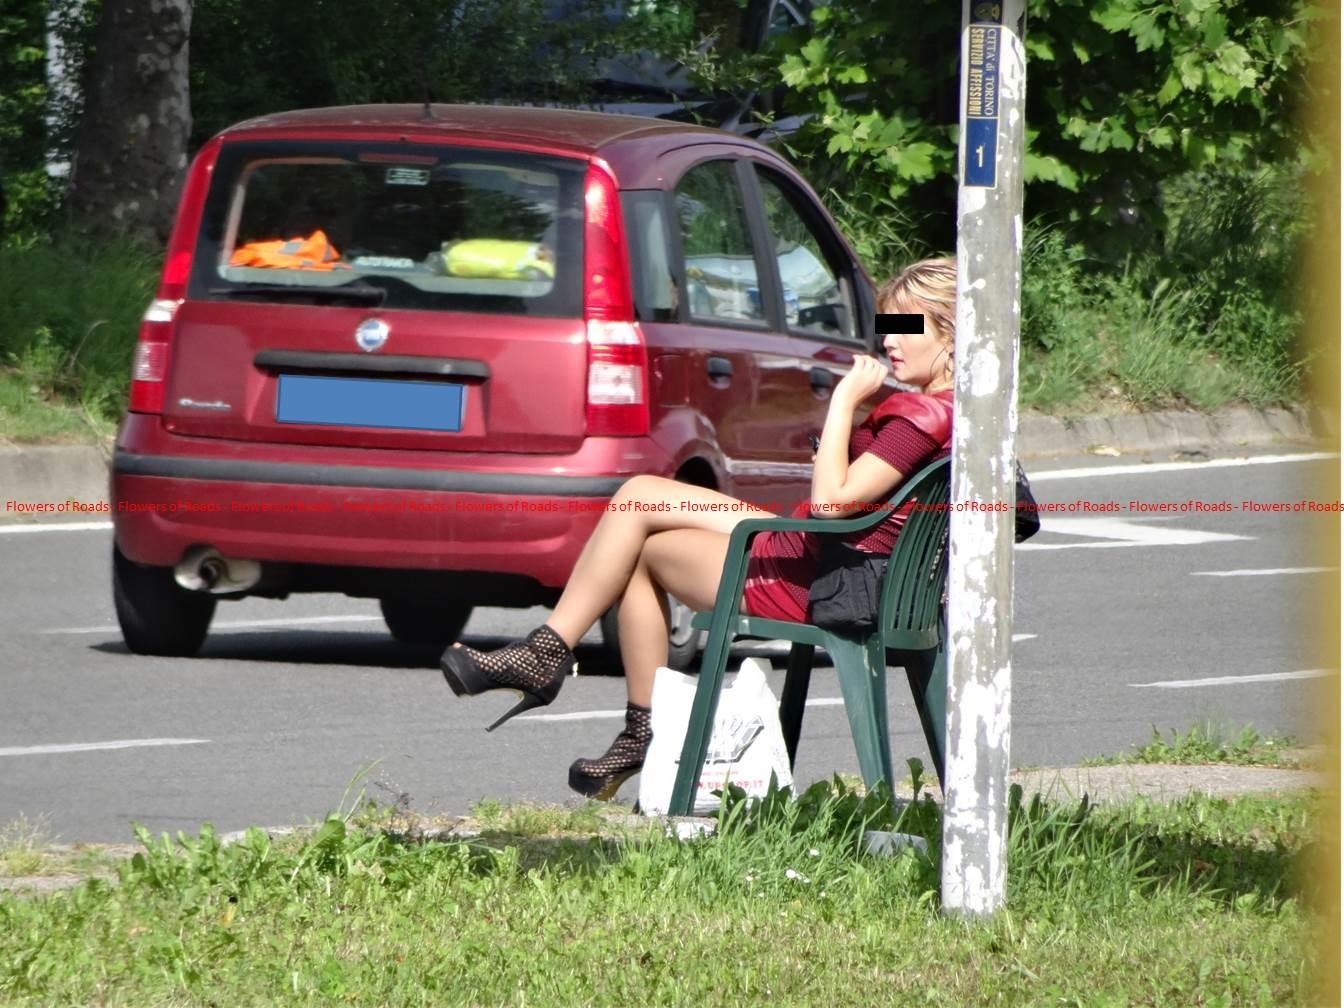 видео проститутки на онлайн дорогах